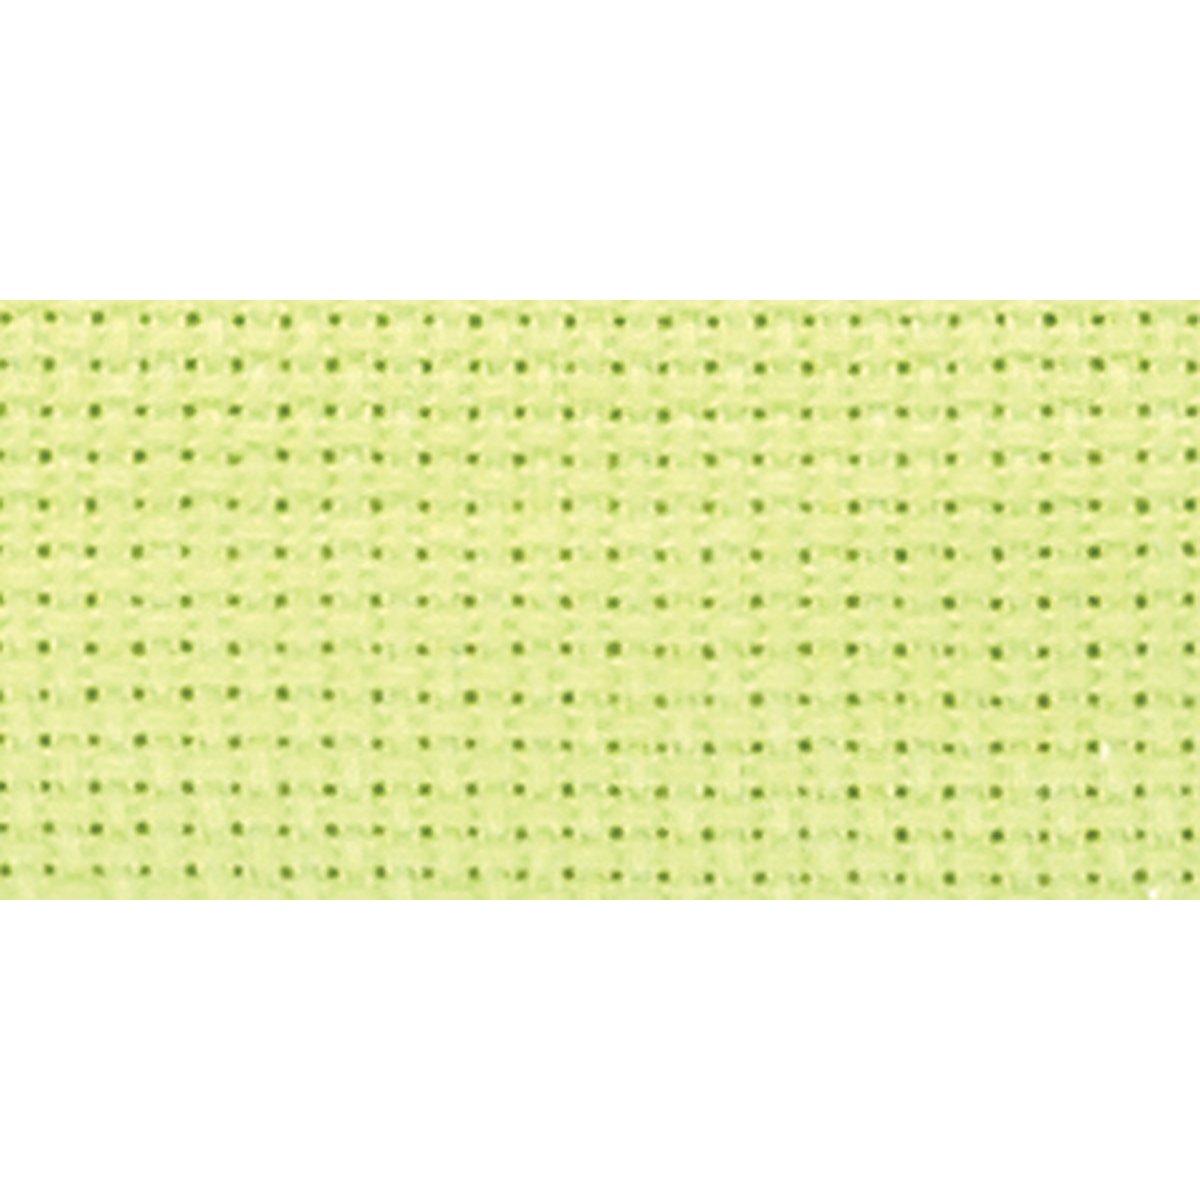 DMC GD1436B-3976 Bright Ideas Aida Cloth, Lemon Twist, 14 Count Notions - In Network